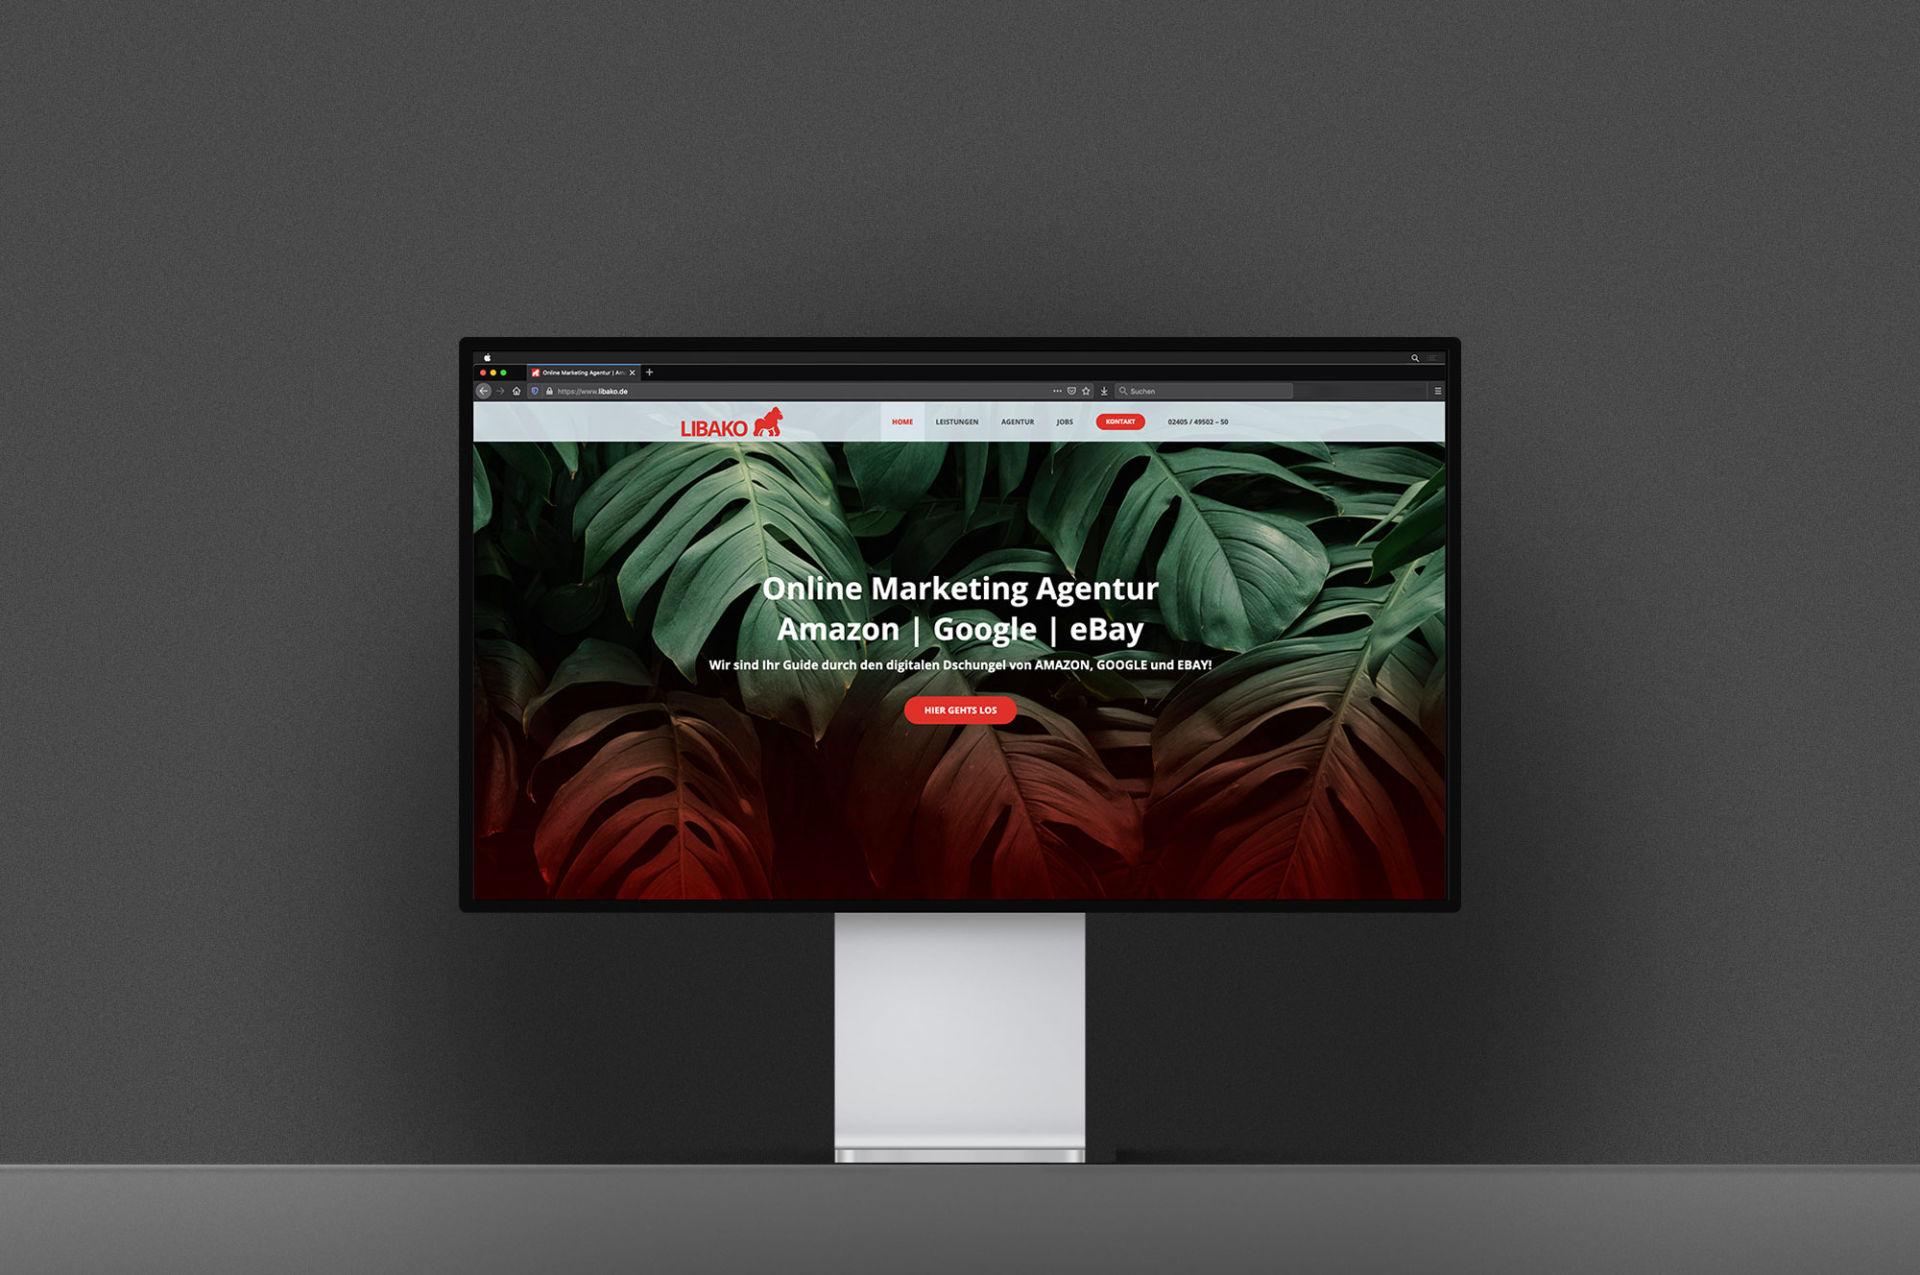 LIBAKO_Website_Mockup_001